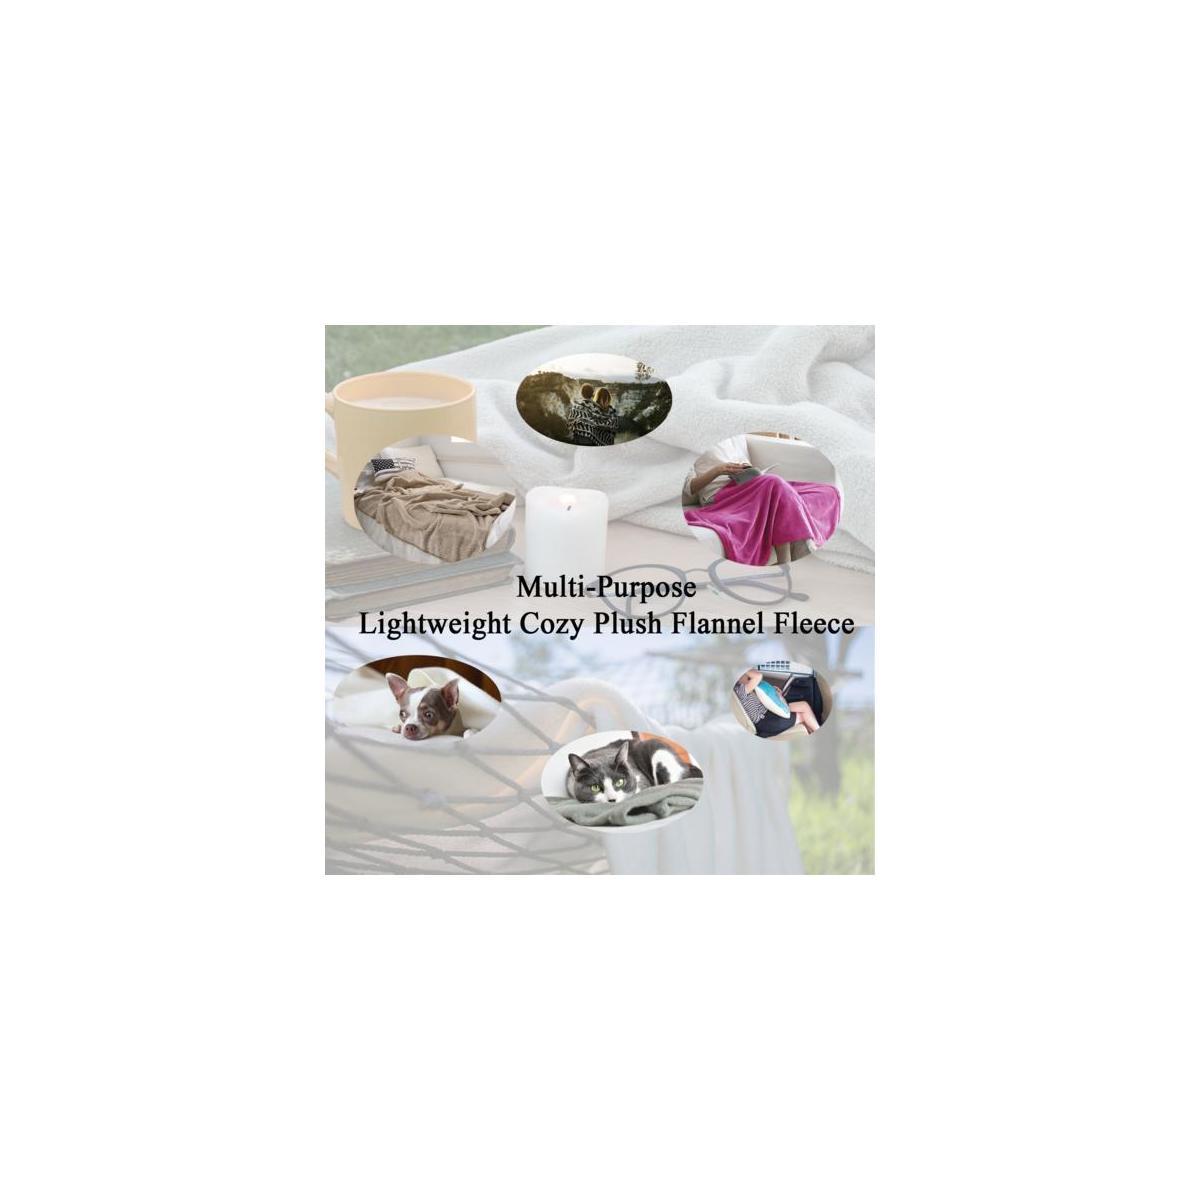 Flannel Fleece Silky Soft Throw Shaggy Blanket Lightweight Comfy and Cozy Plush Microfiber Travel Silk 50